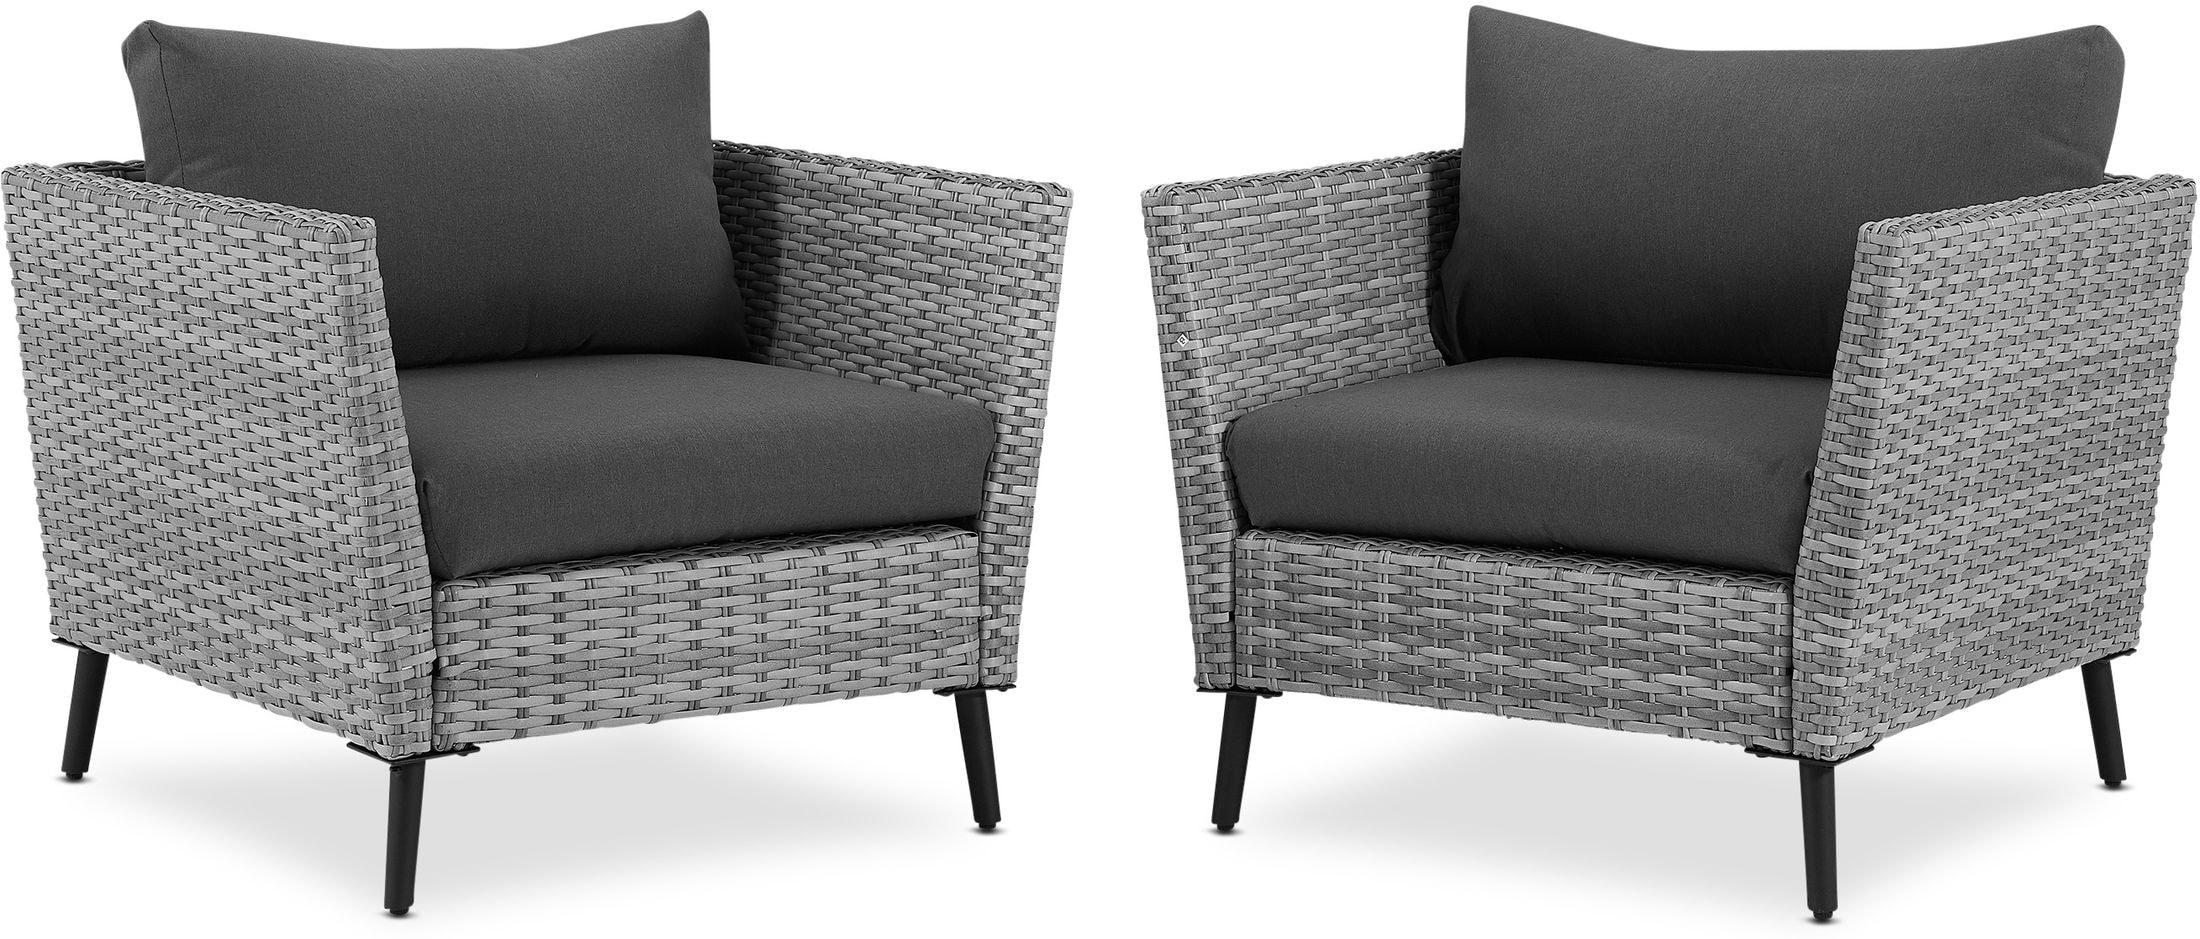 Outdoor Furniture - Ventura Set of 2 Outdoor Chairs